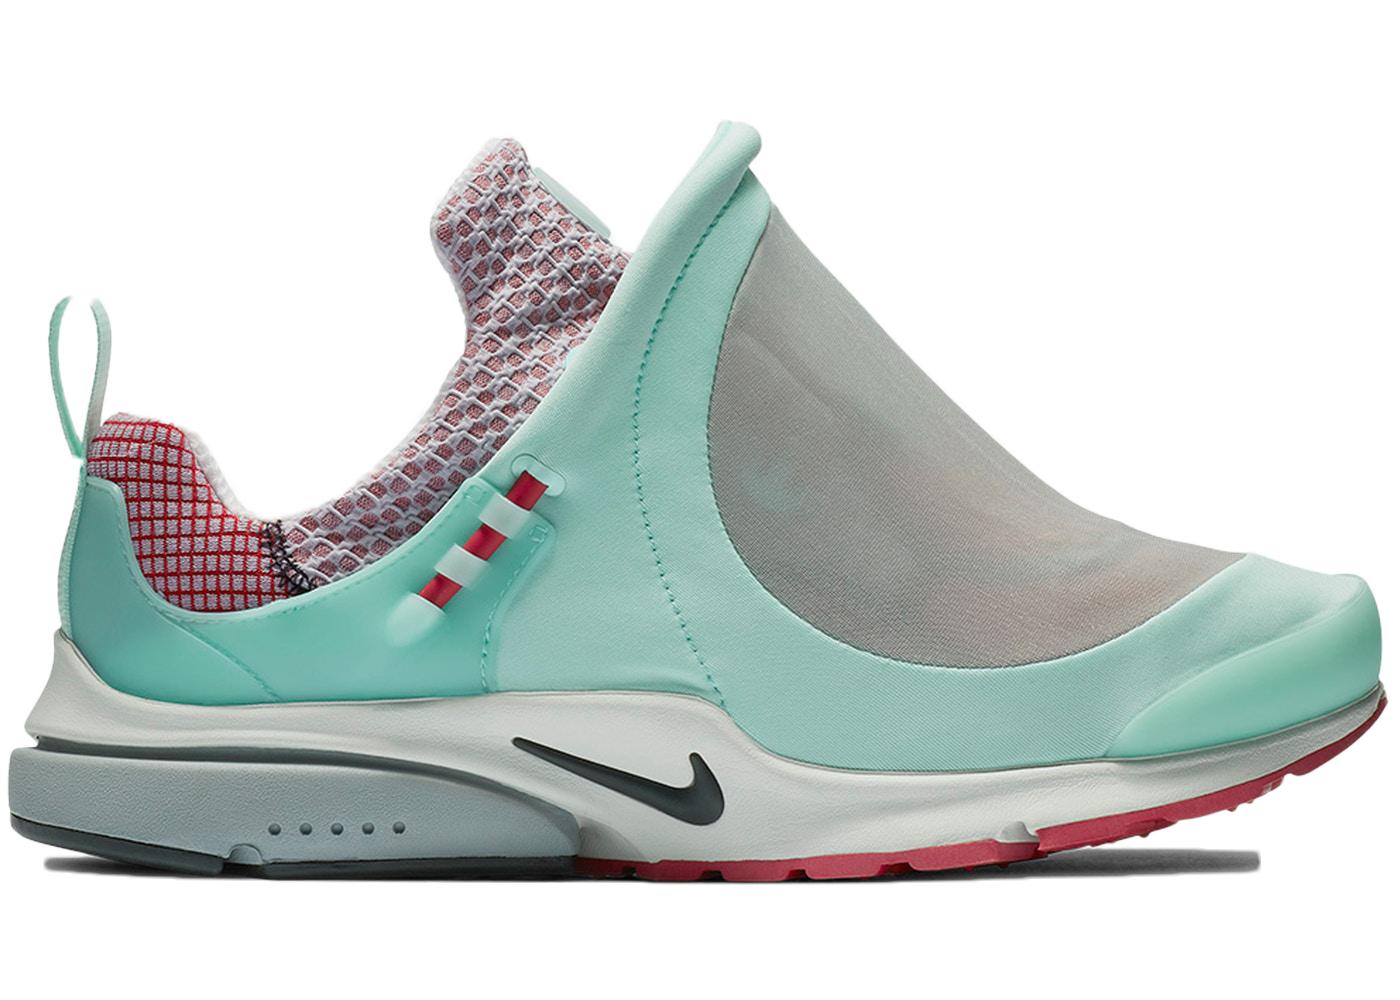 Nike Presto Foot Tent Comme des Garcons